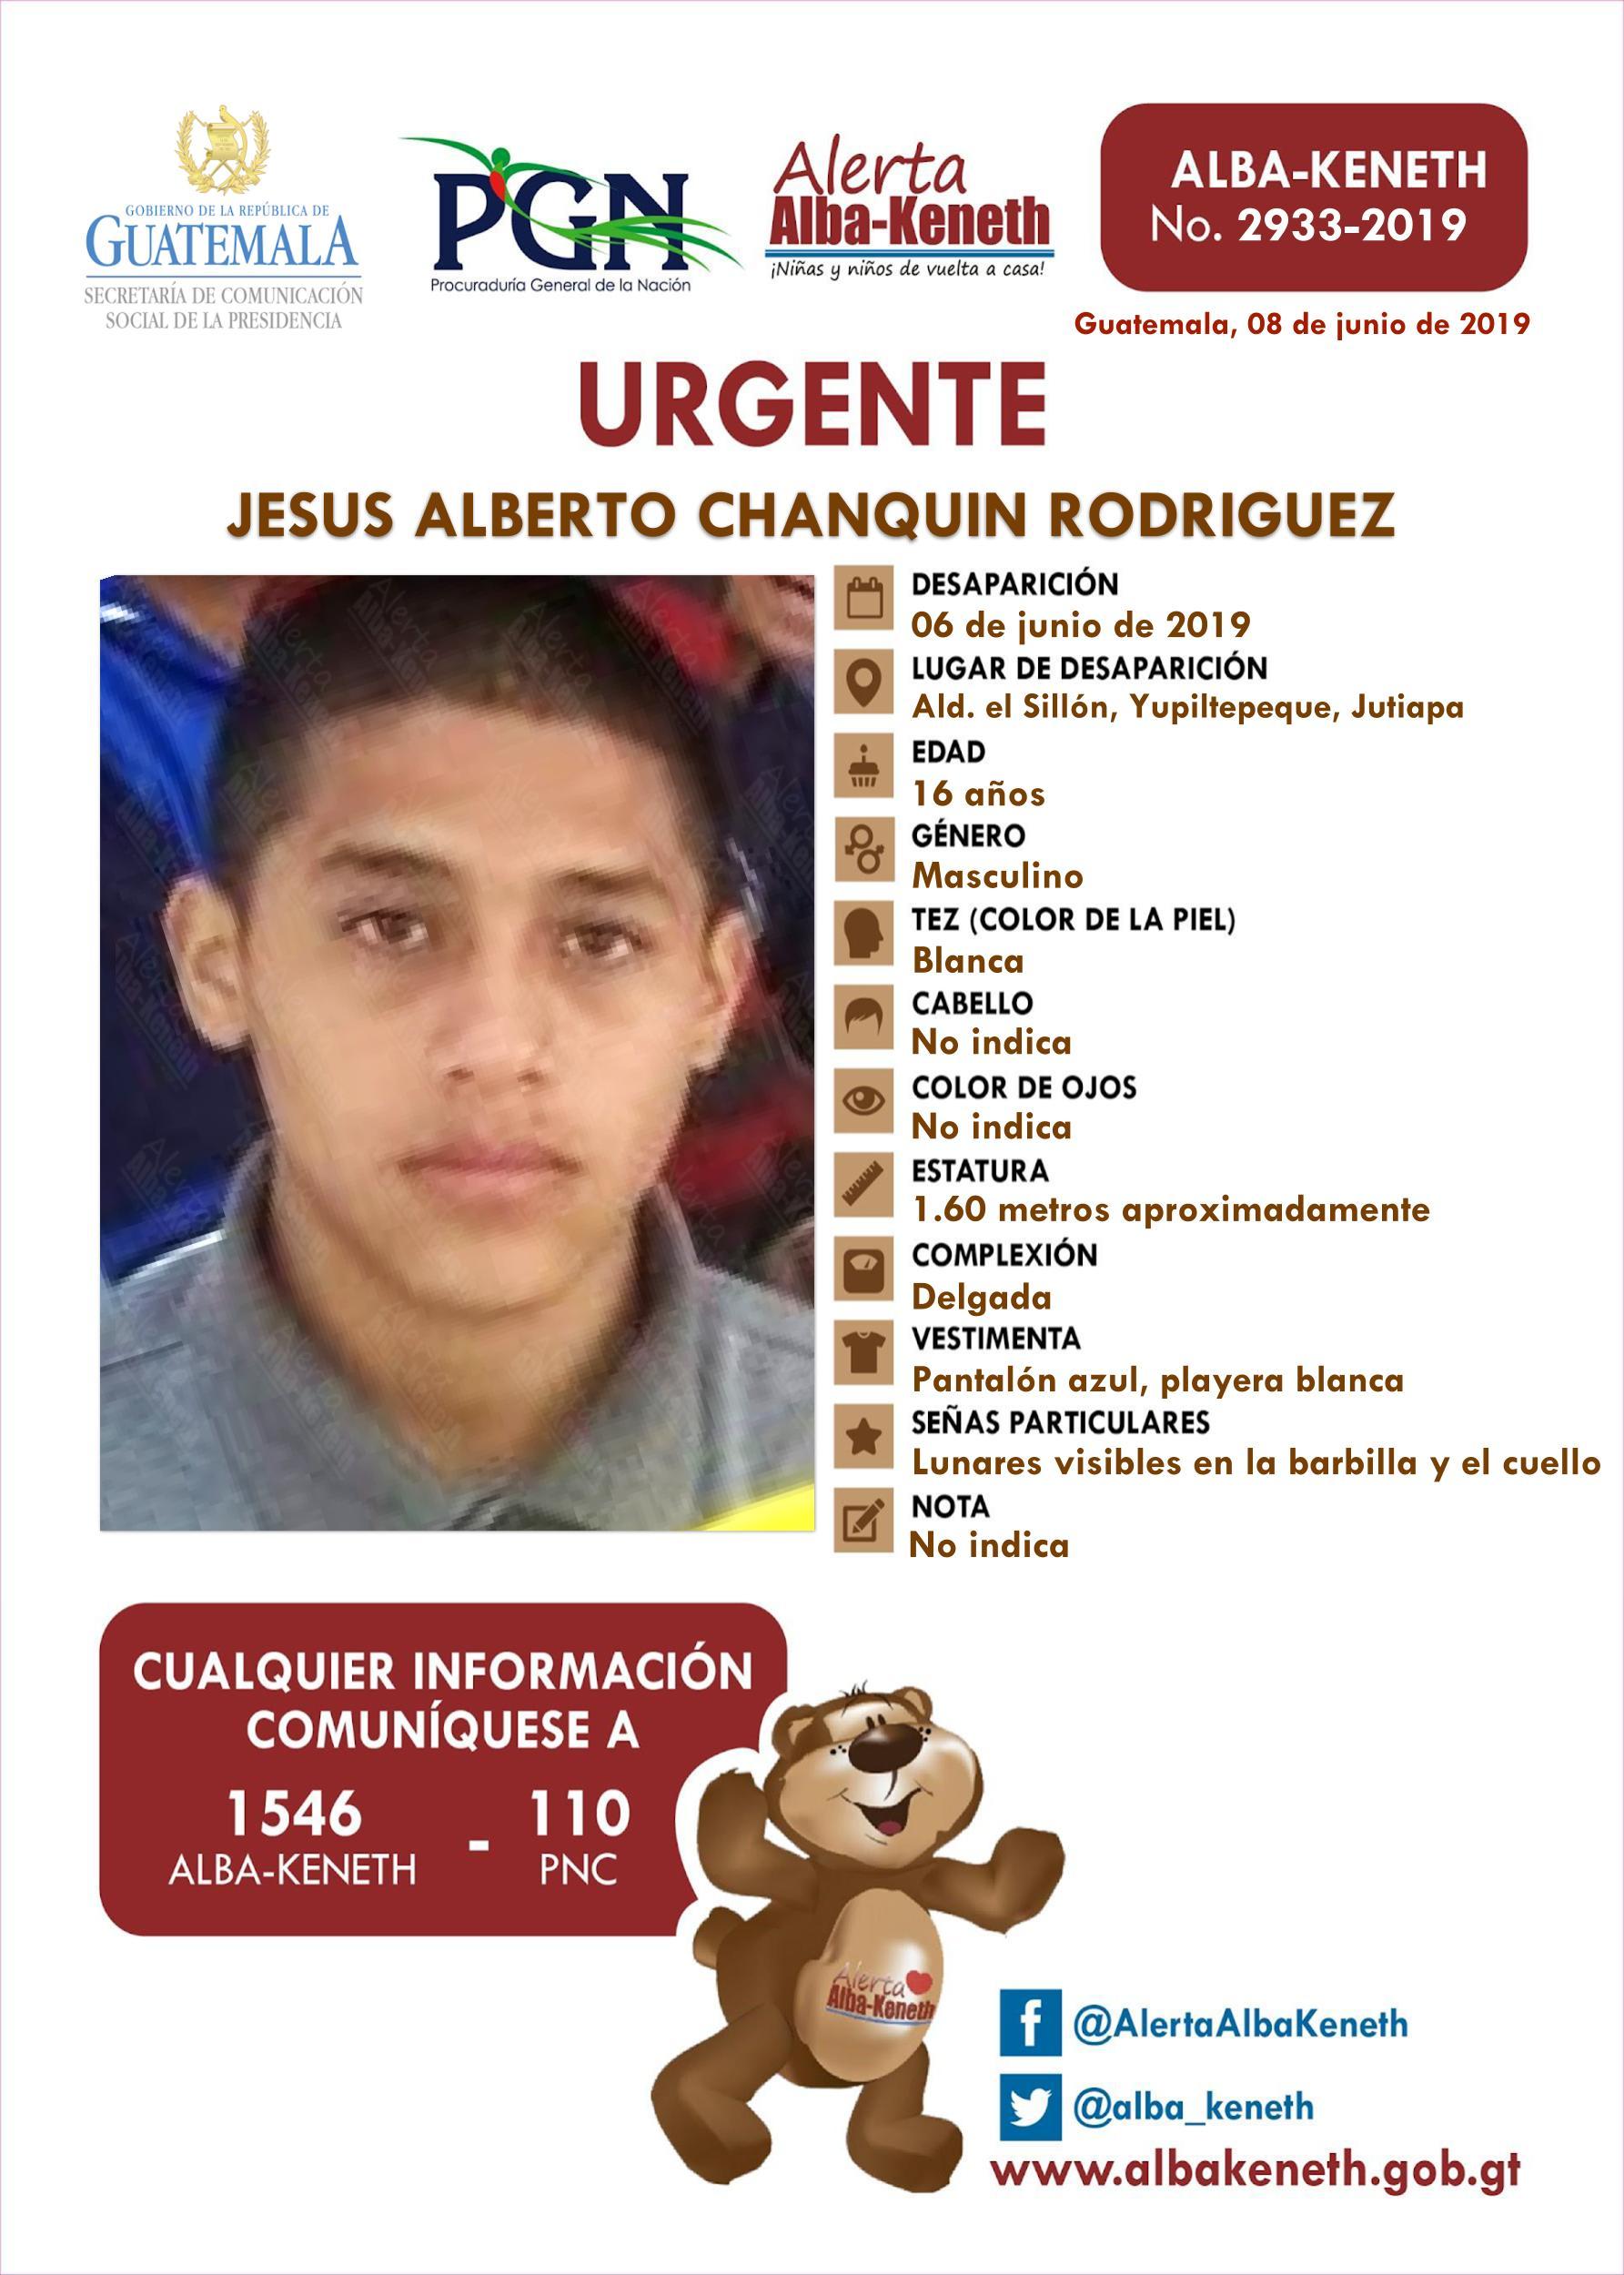 Jesus Alberto Chanquin Rodriguez